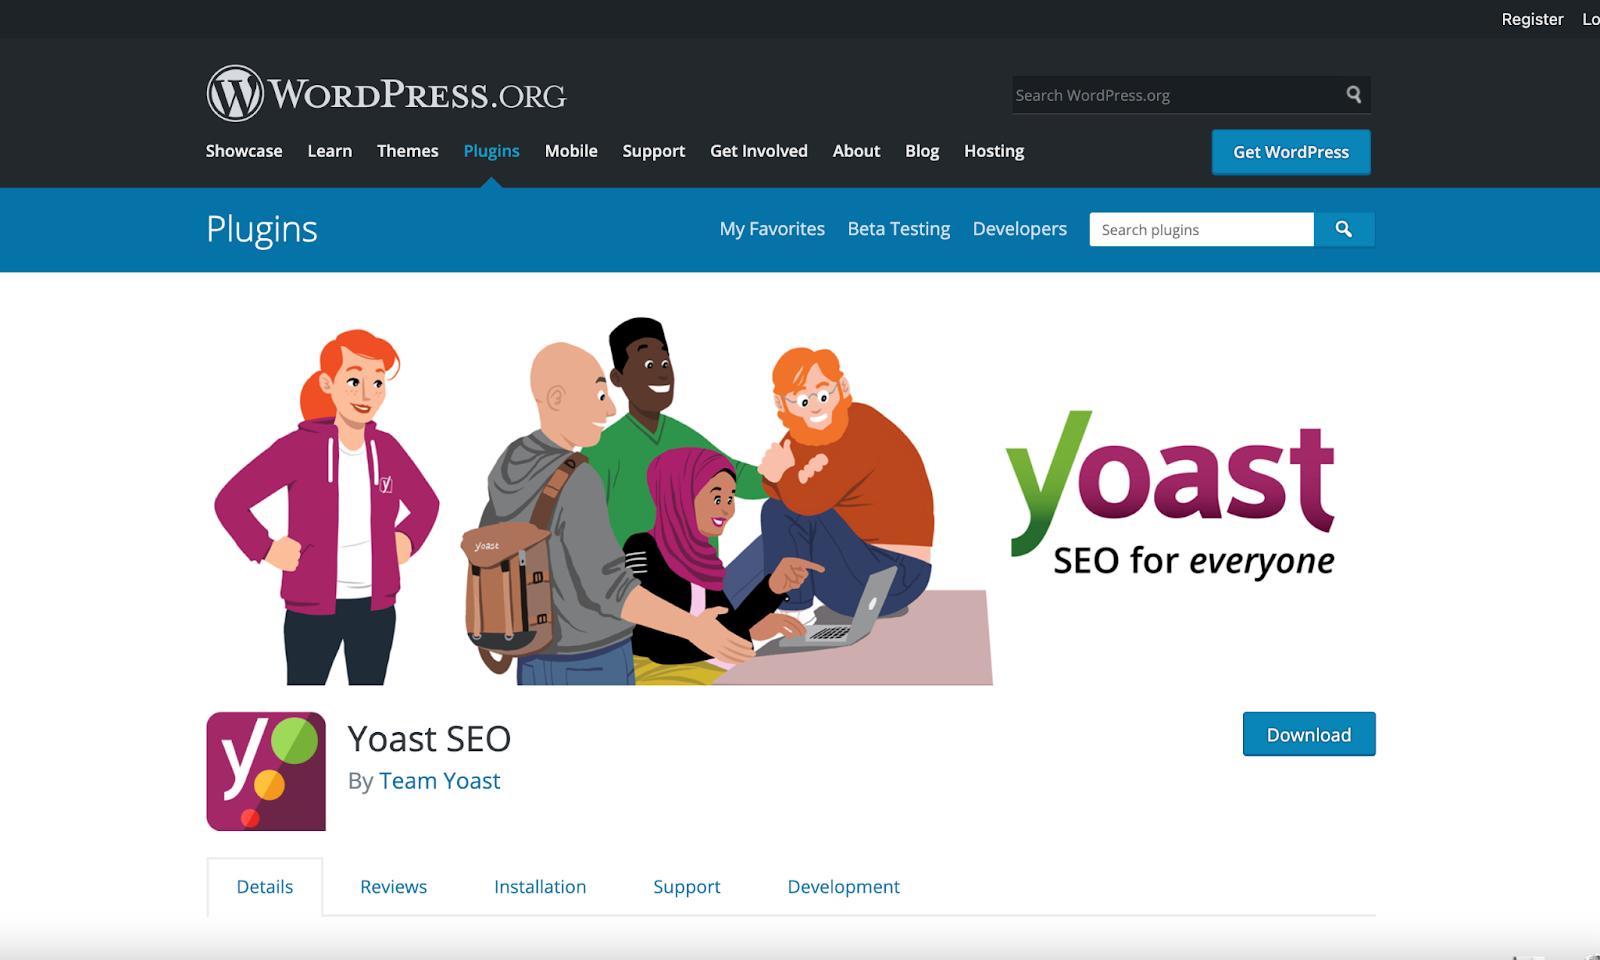 Yoast SEO – Plugins for Health Coaches